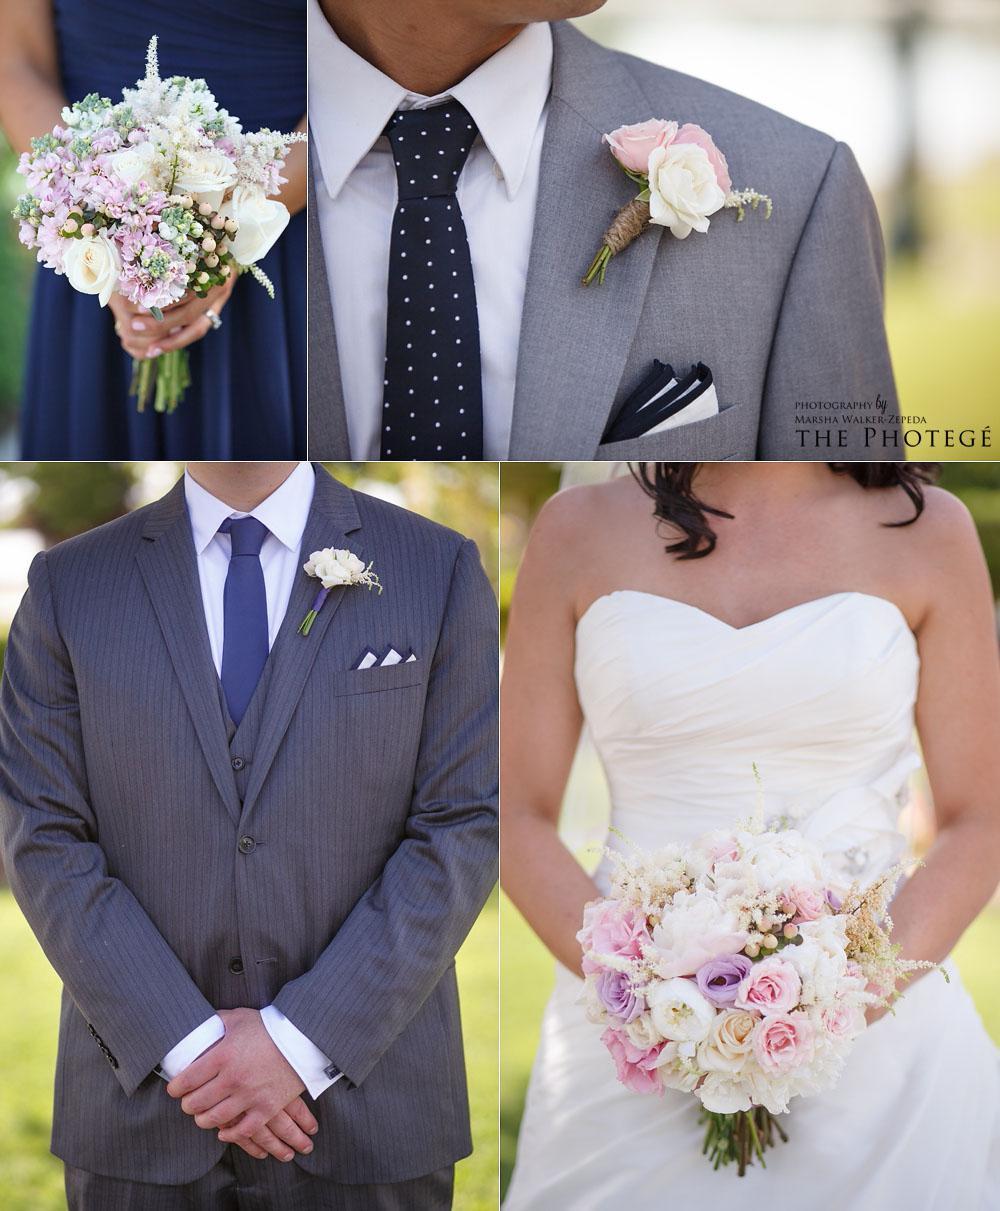 bridal party details, shafter park place wedding